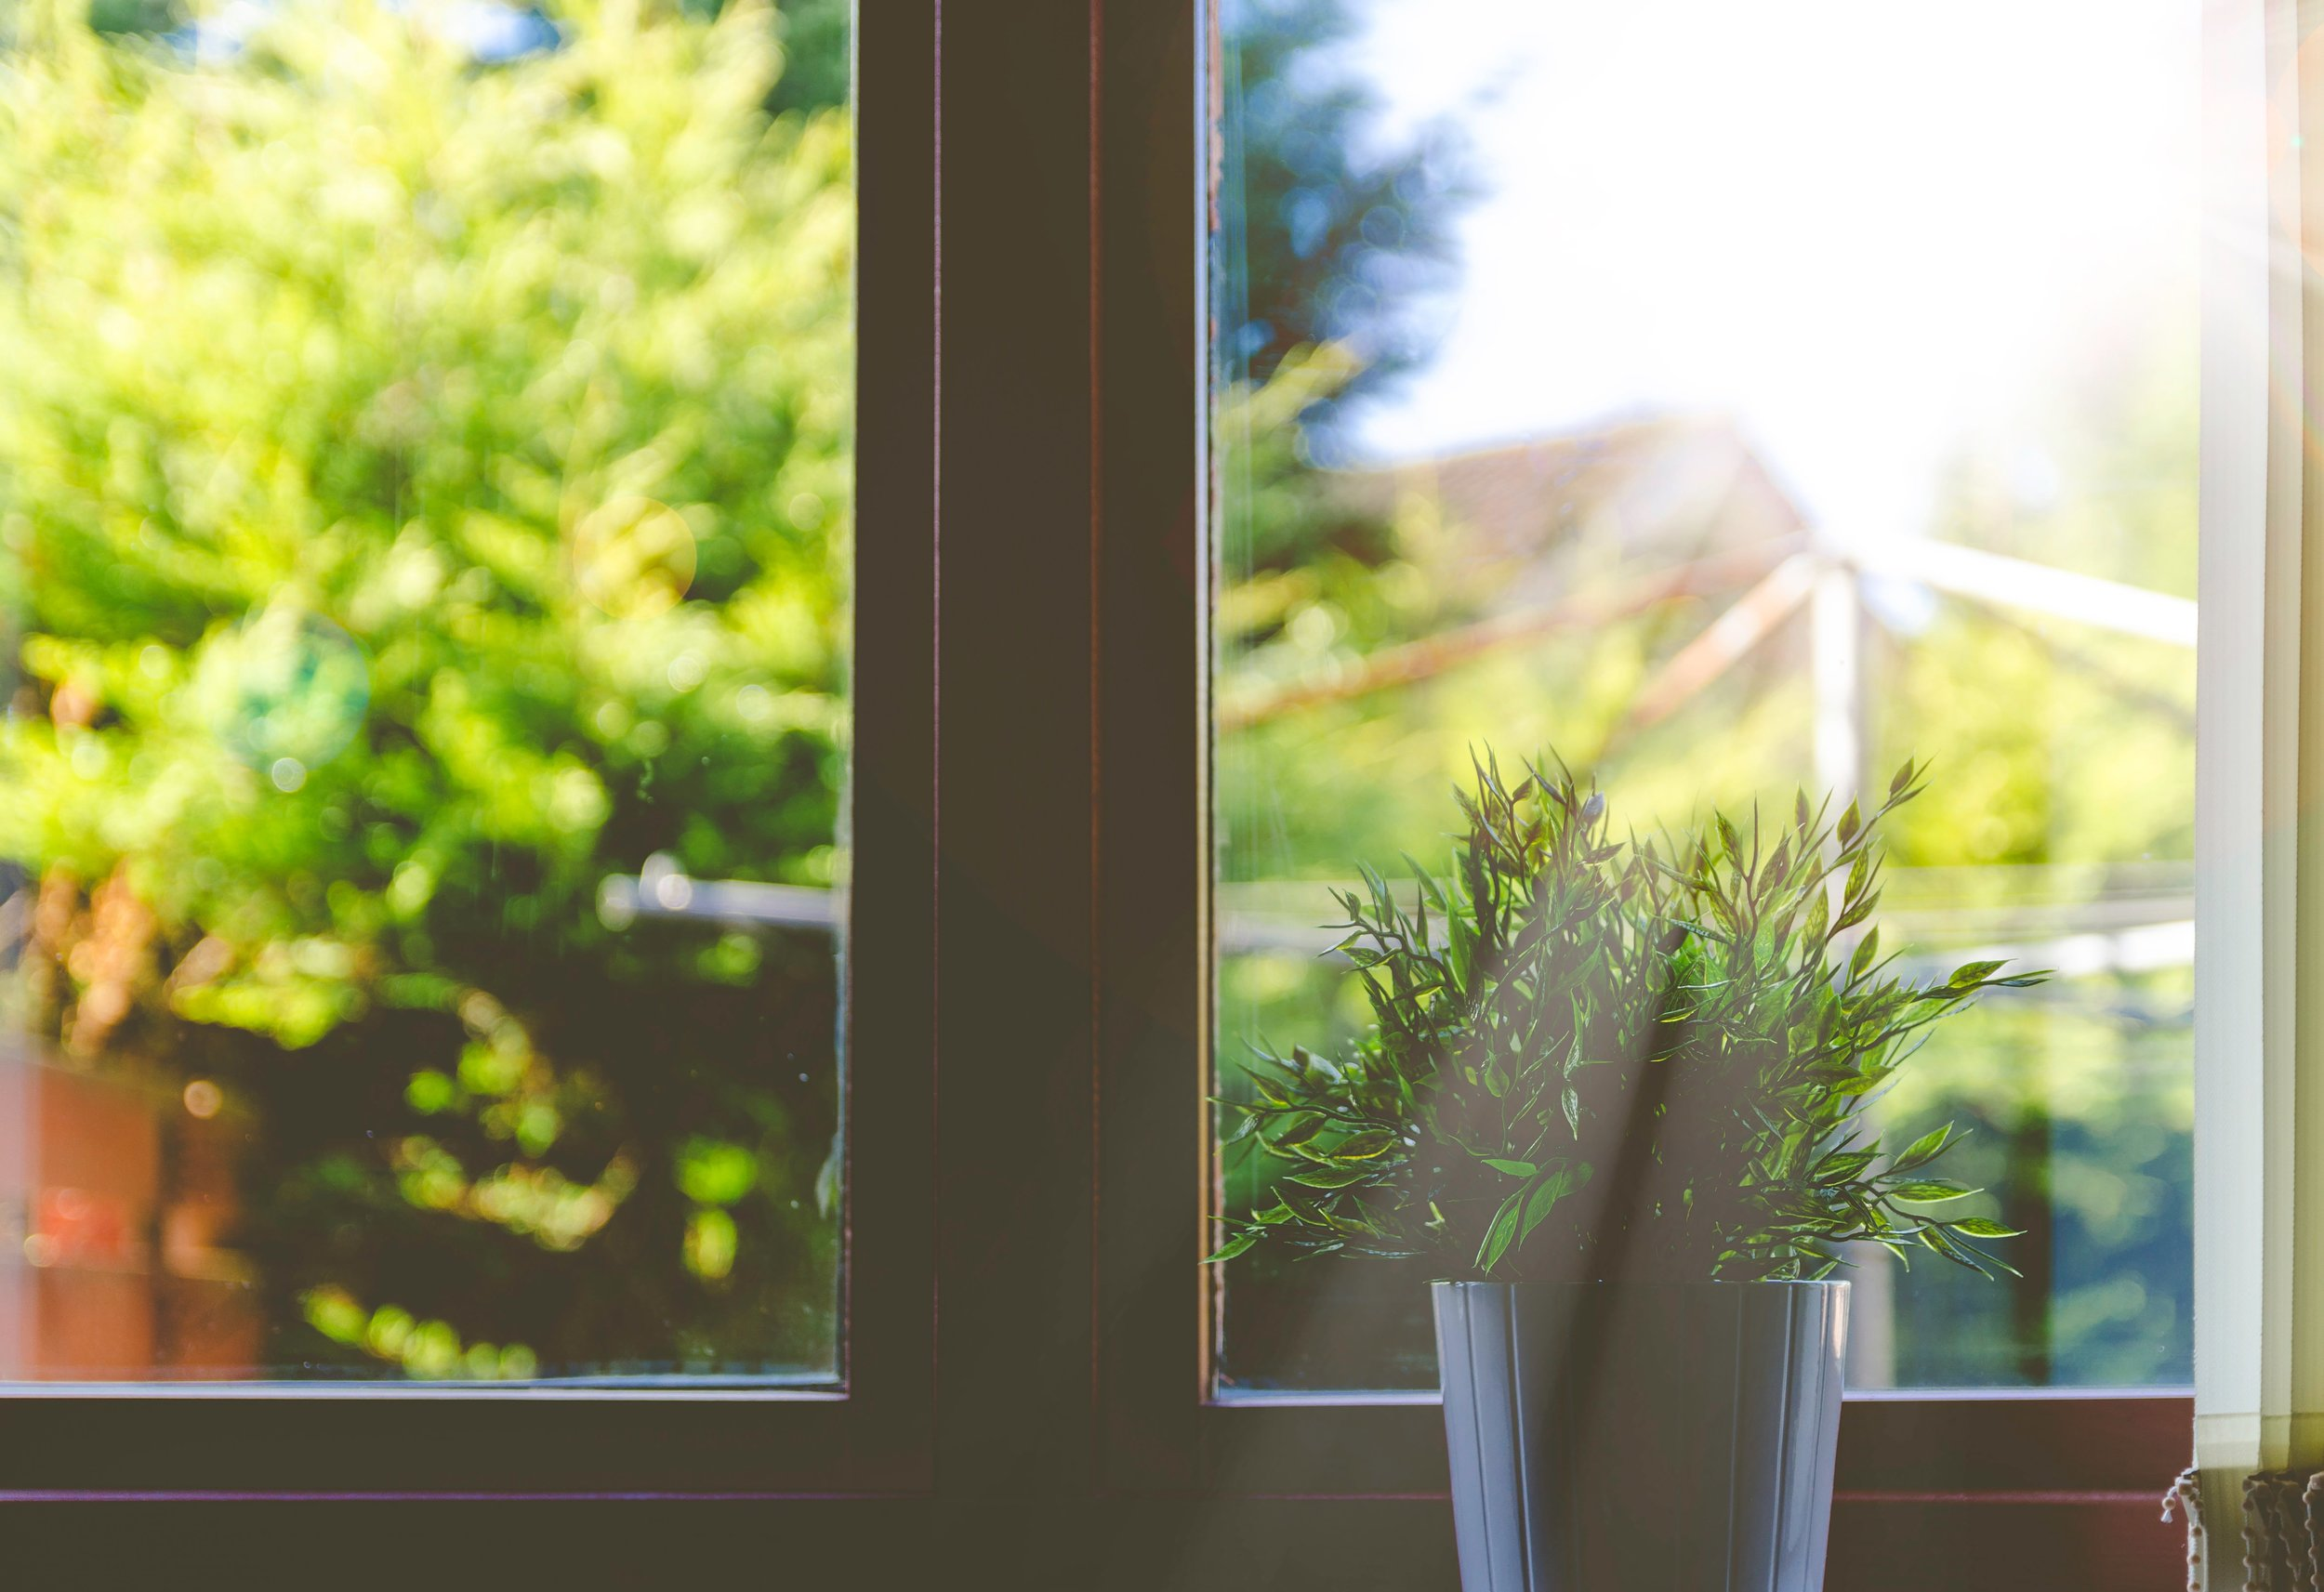 window_ledge with_small_plant_and_sun_shinging_through_photography_by_olu-eletu-101178-unsplash.jpg